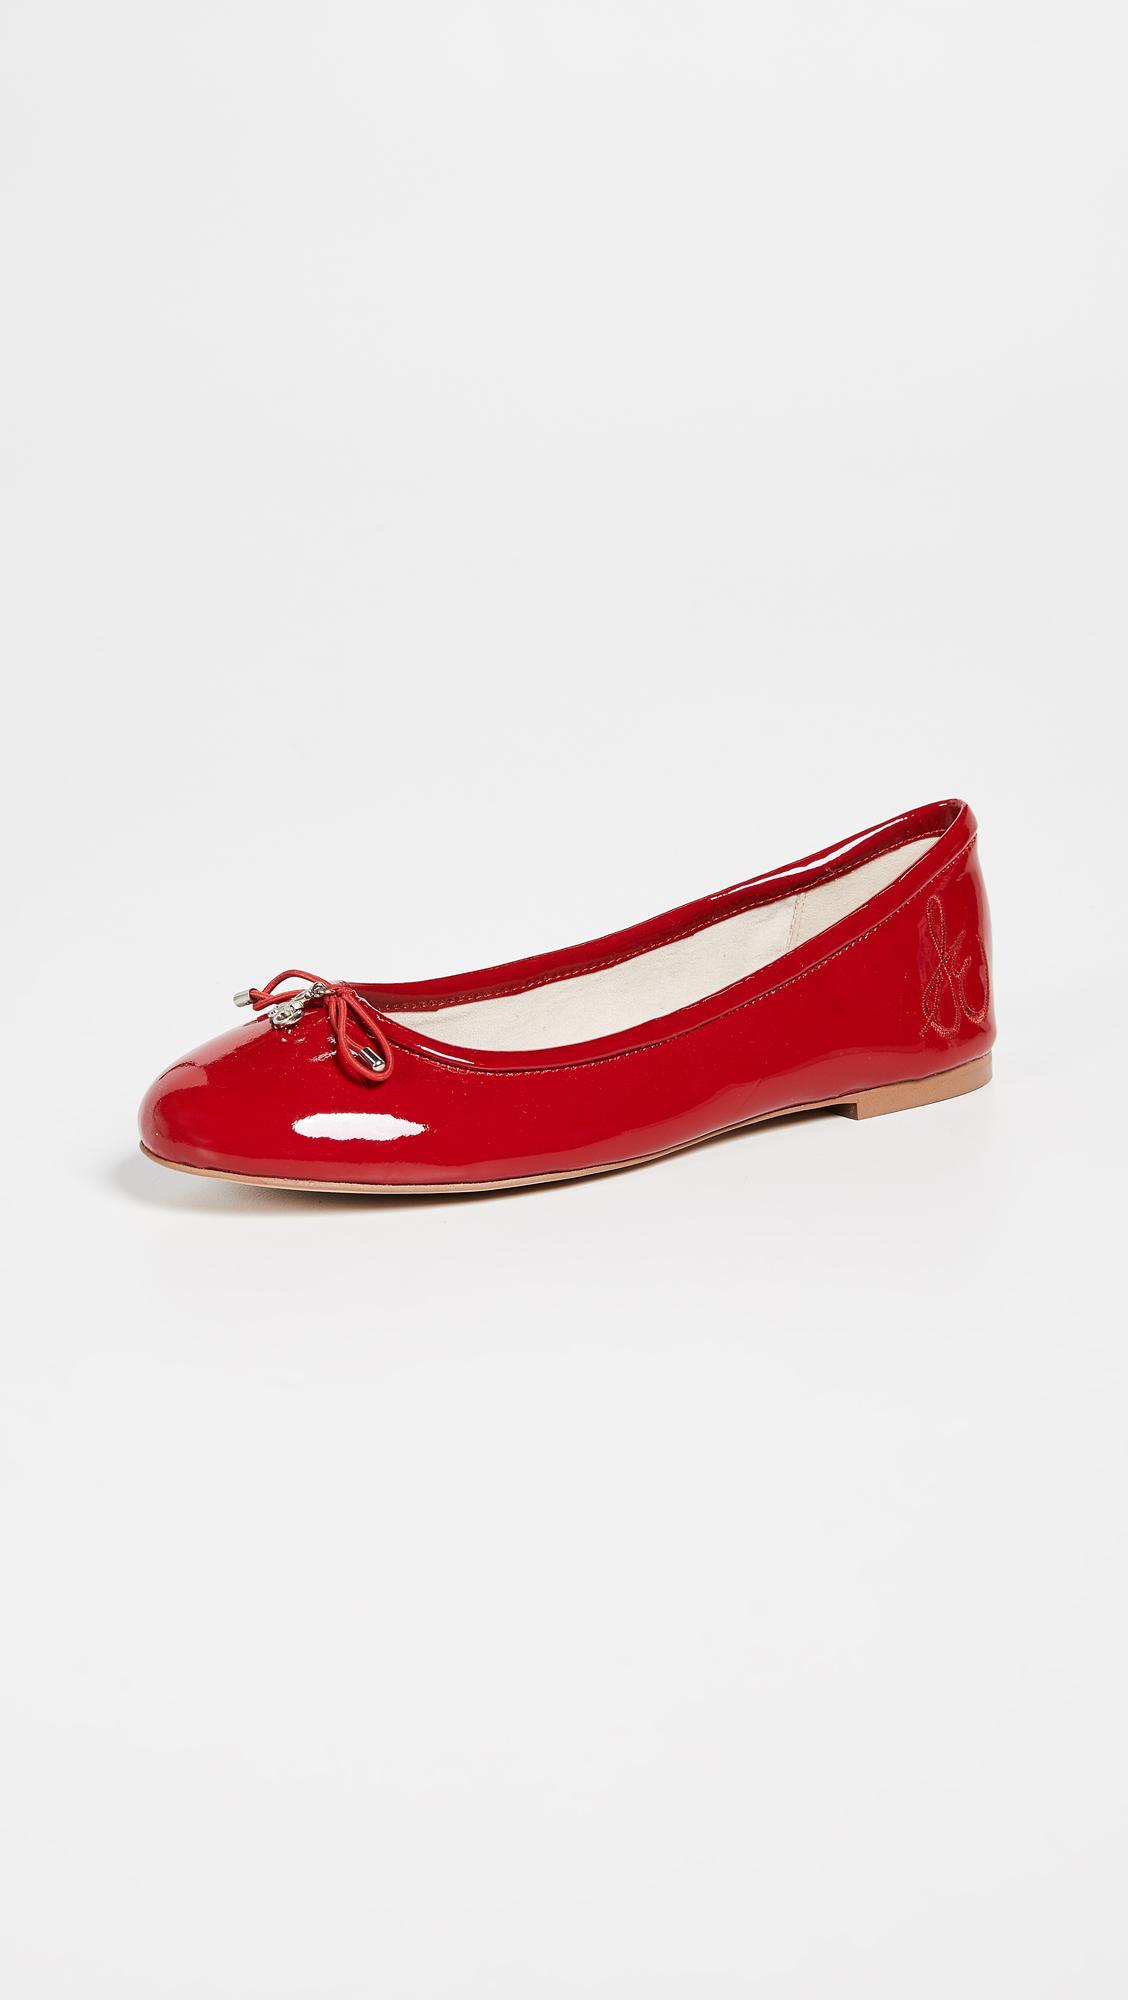 24cb1b4fc Sam Edelman Felicia Ballet Flats in Red - Lyst